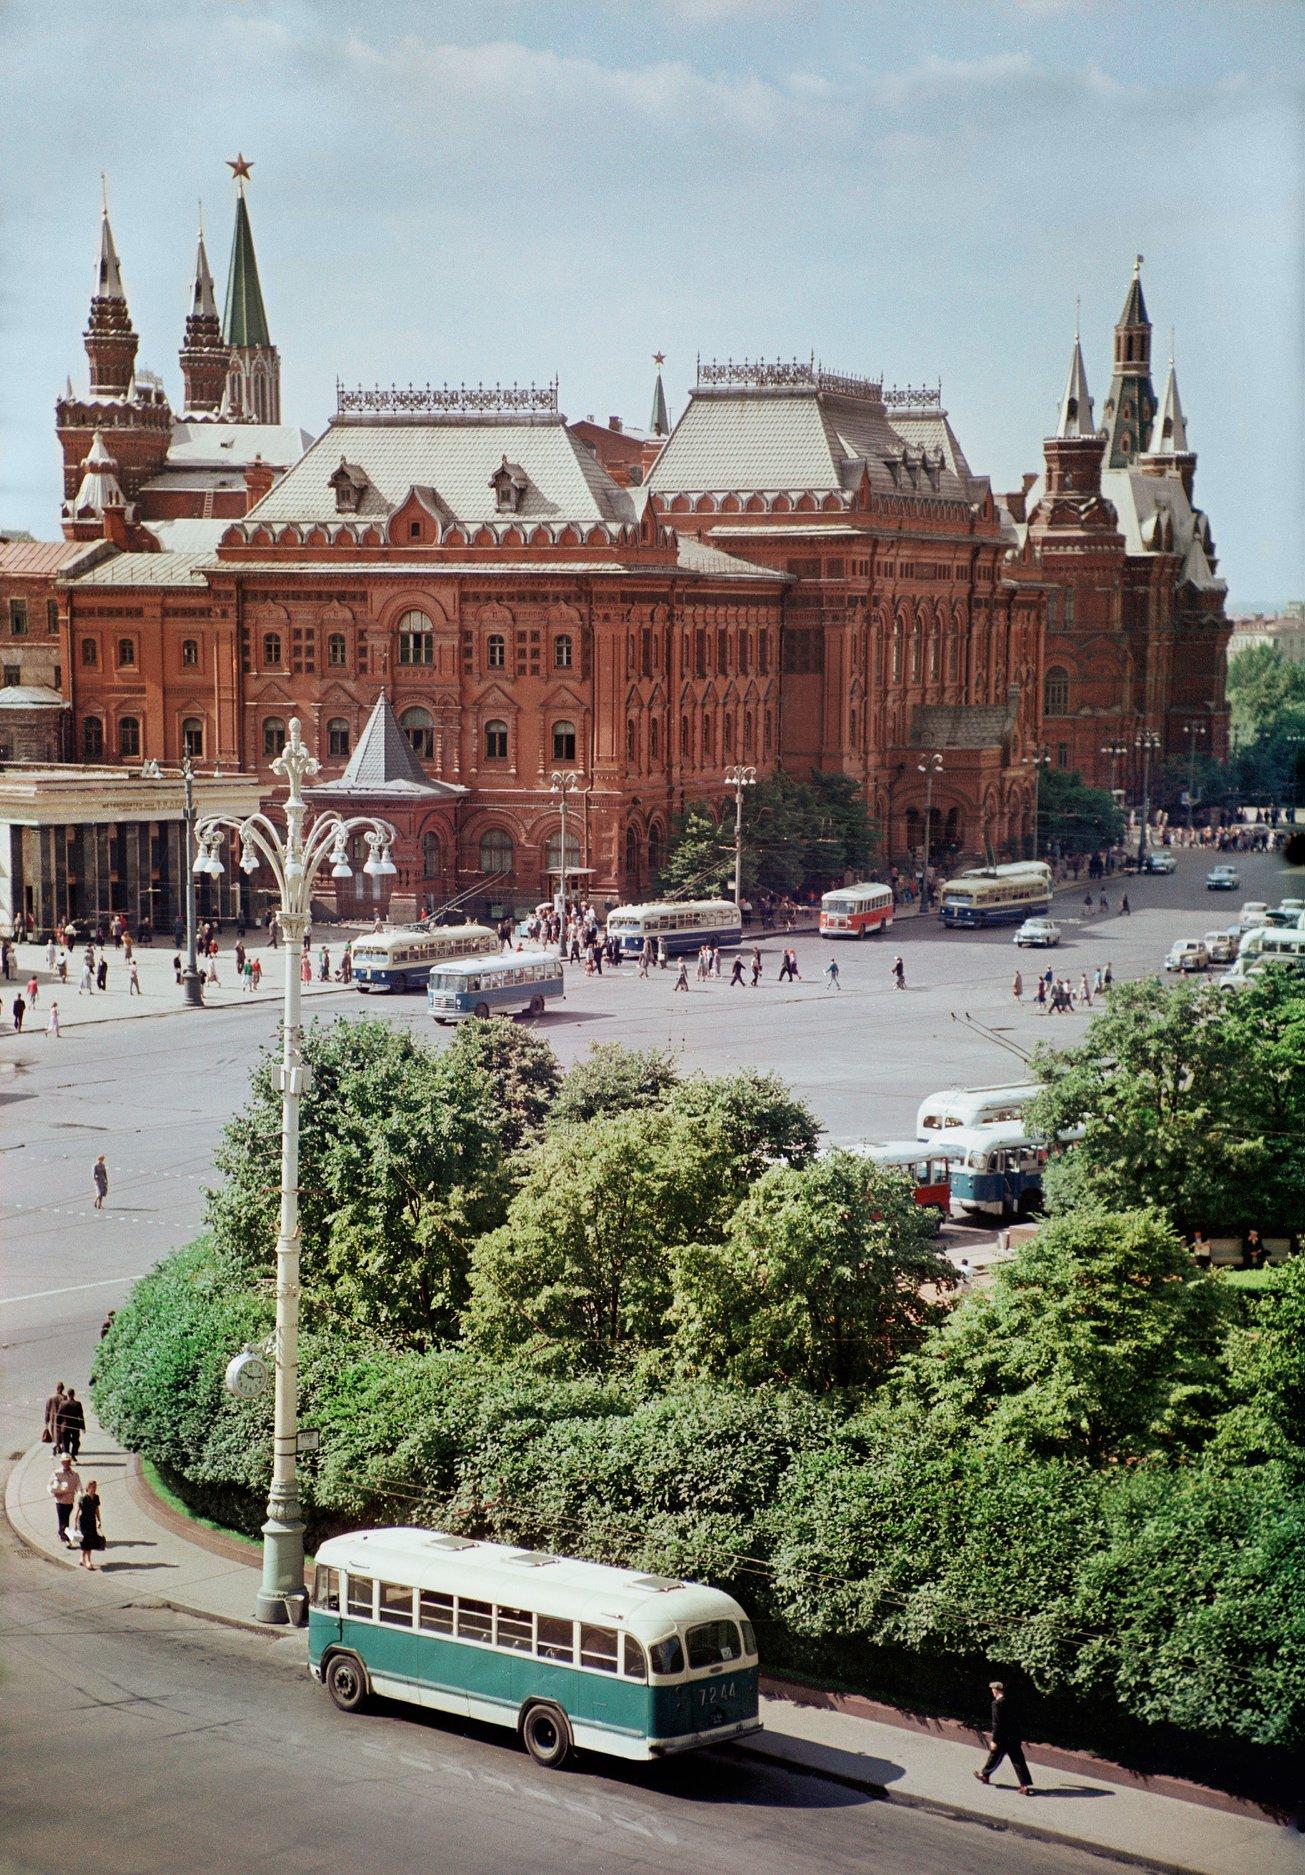 1961 Москва, Площадь Революции, фото ТАСС